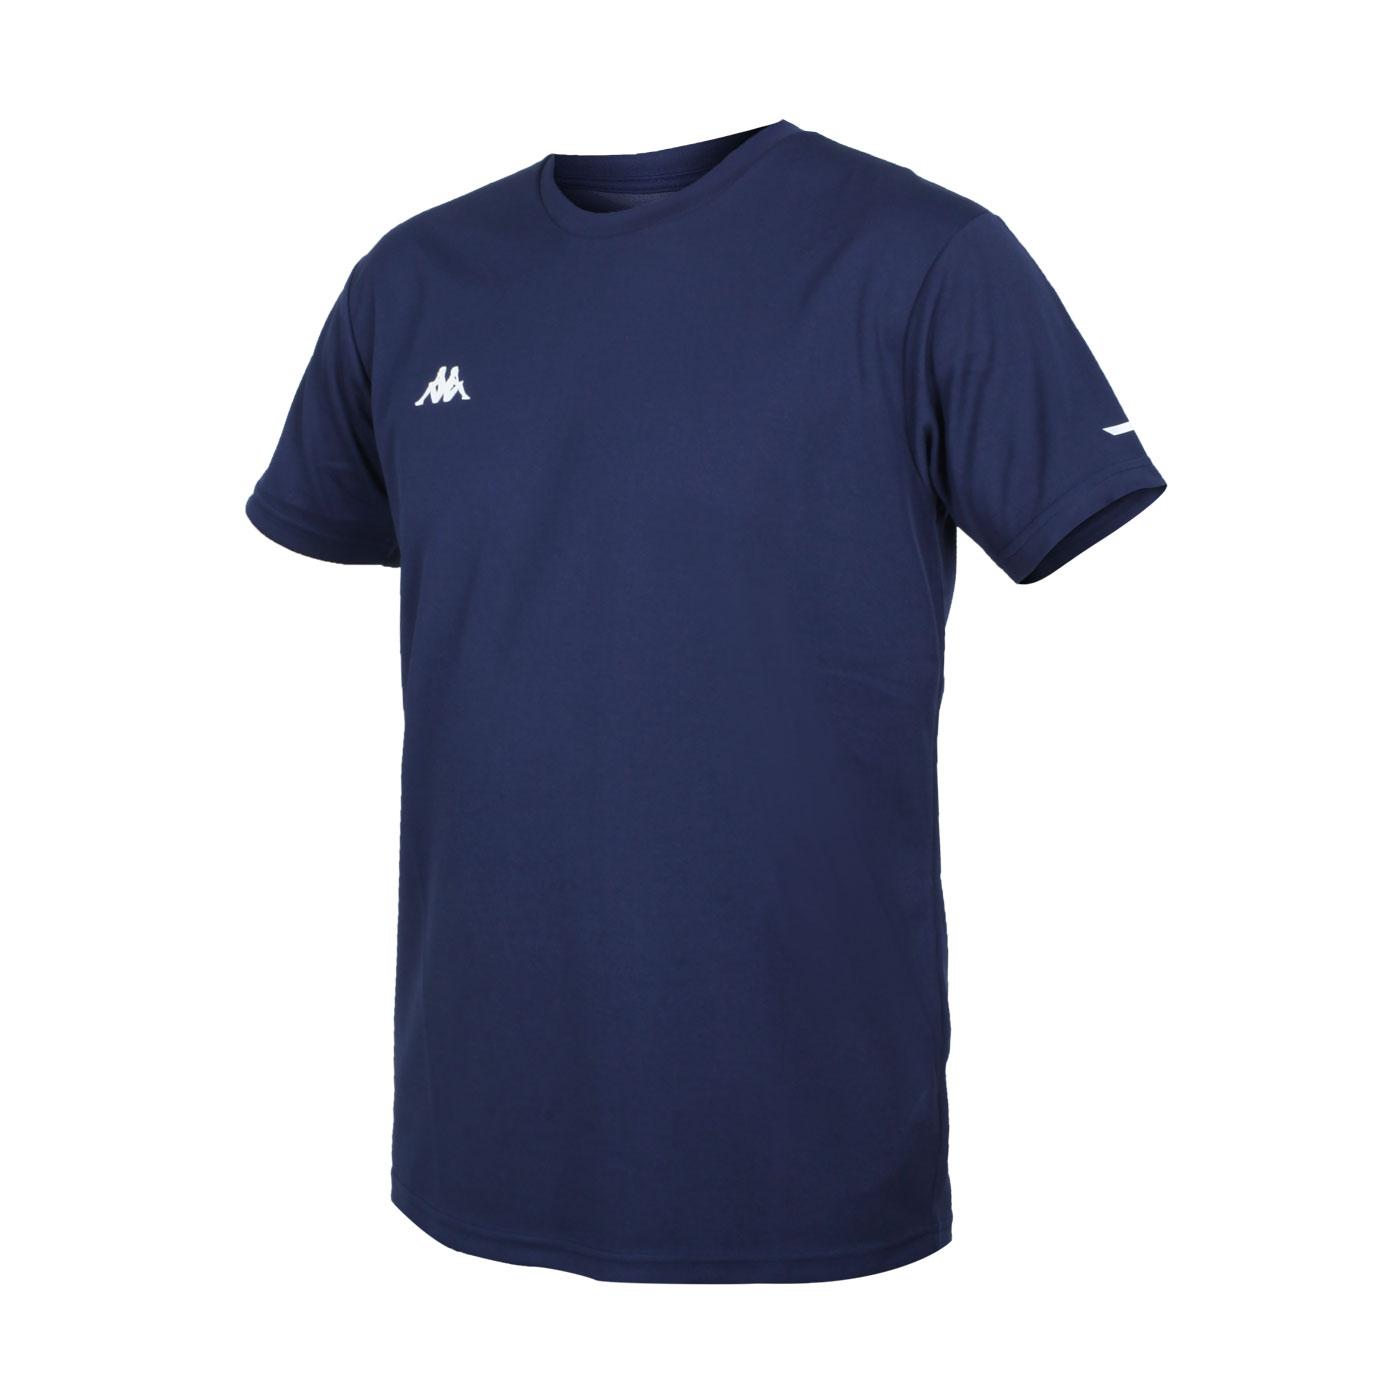 KAPPA 男款K4T短袖T恤 33162PW-B29